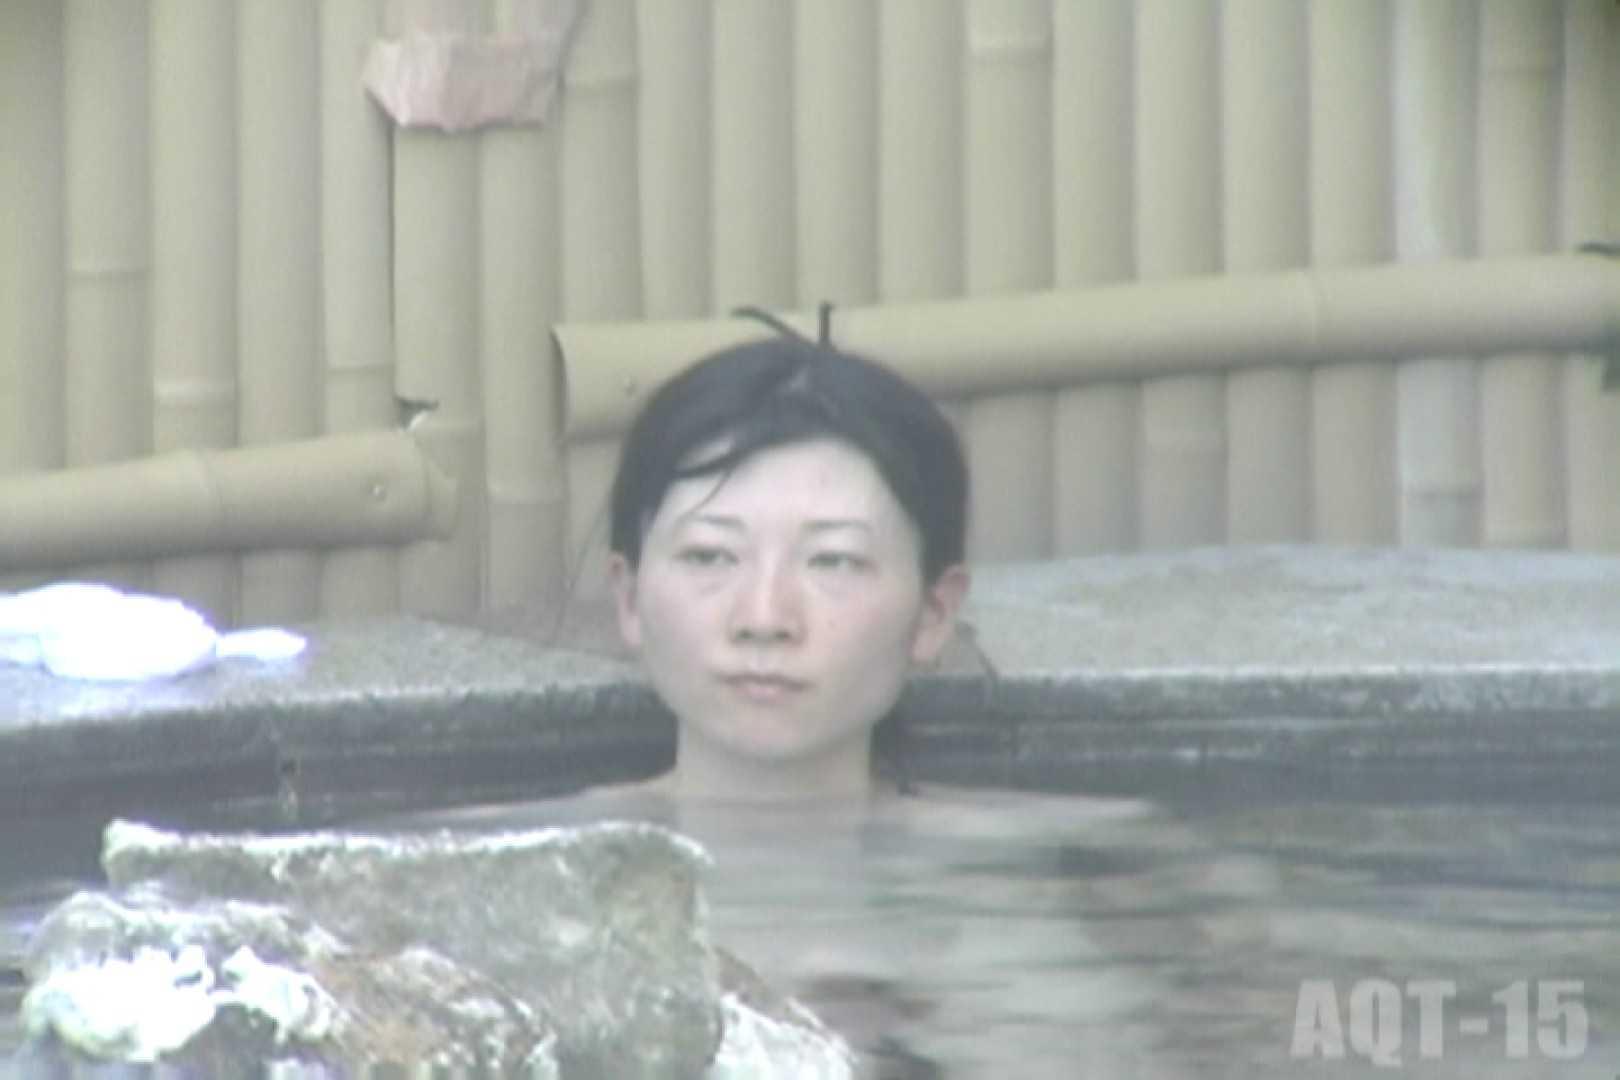 Aquaな露天風呂Vol.835 盗撮 | HなOL  73pic 36